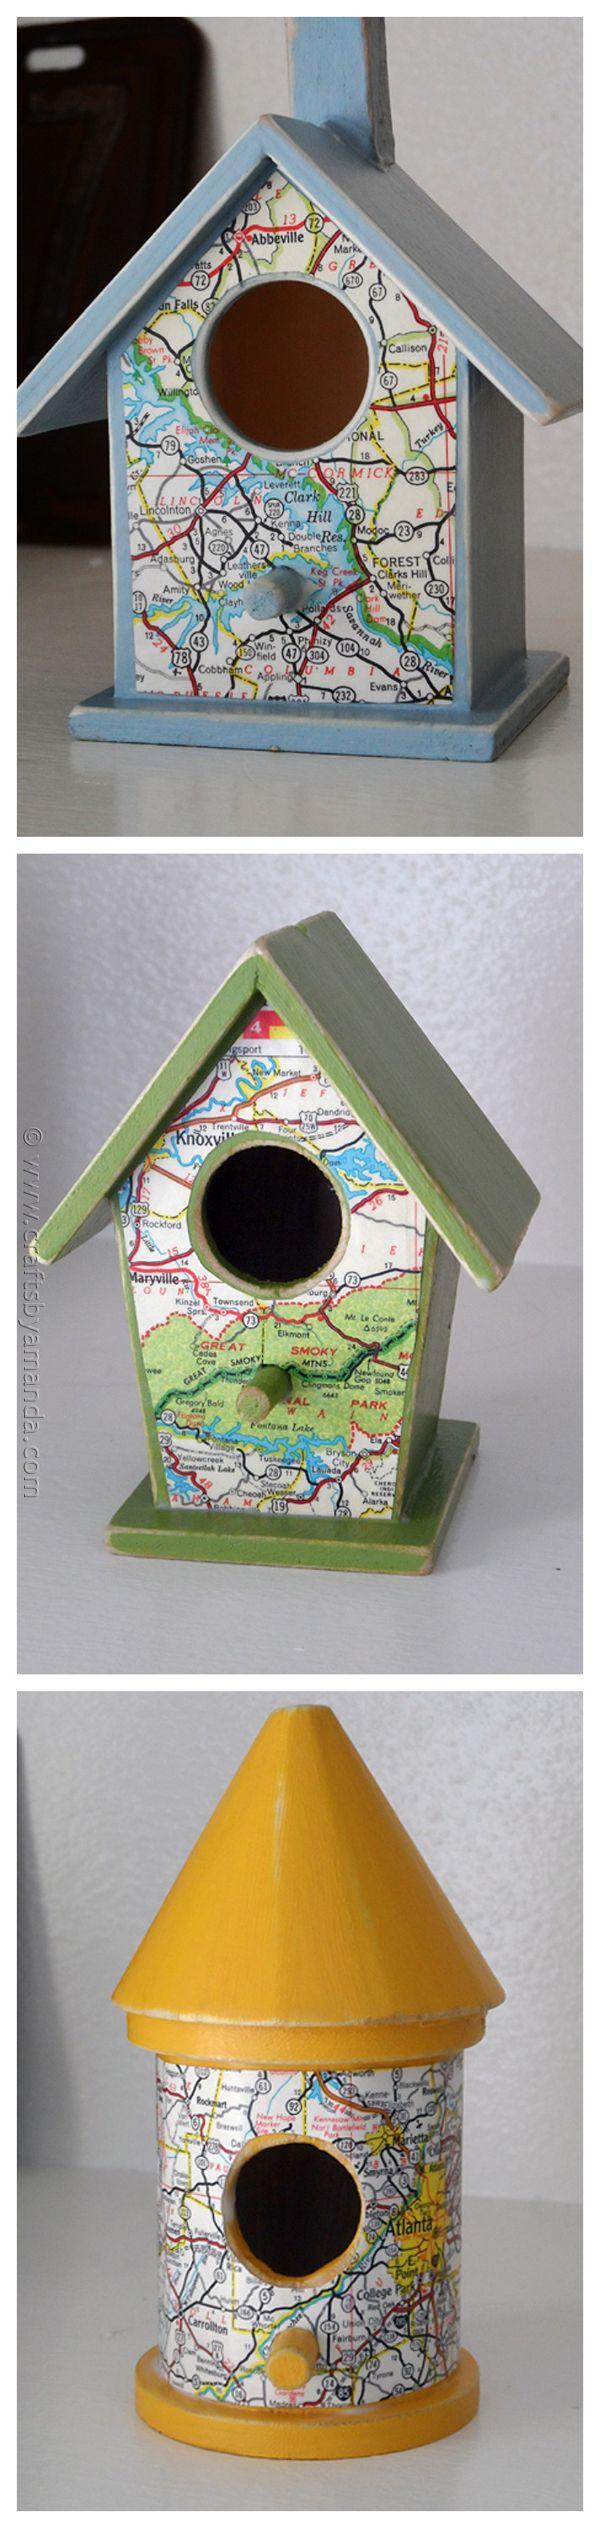 DIY Map Birdhouses